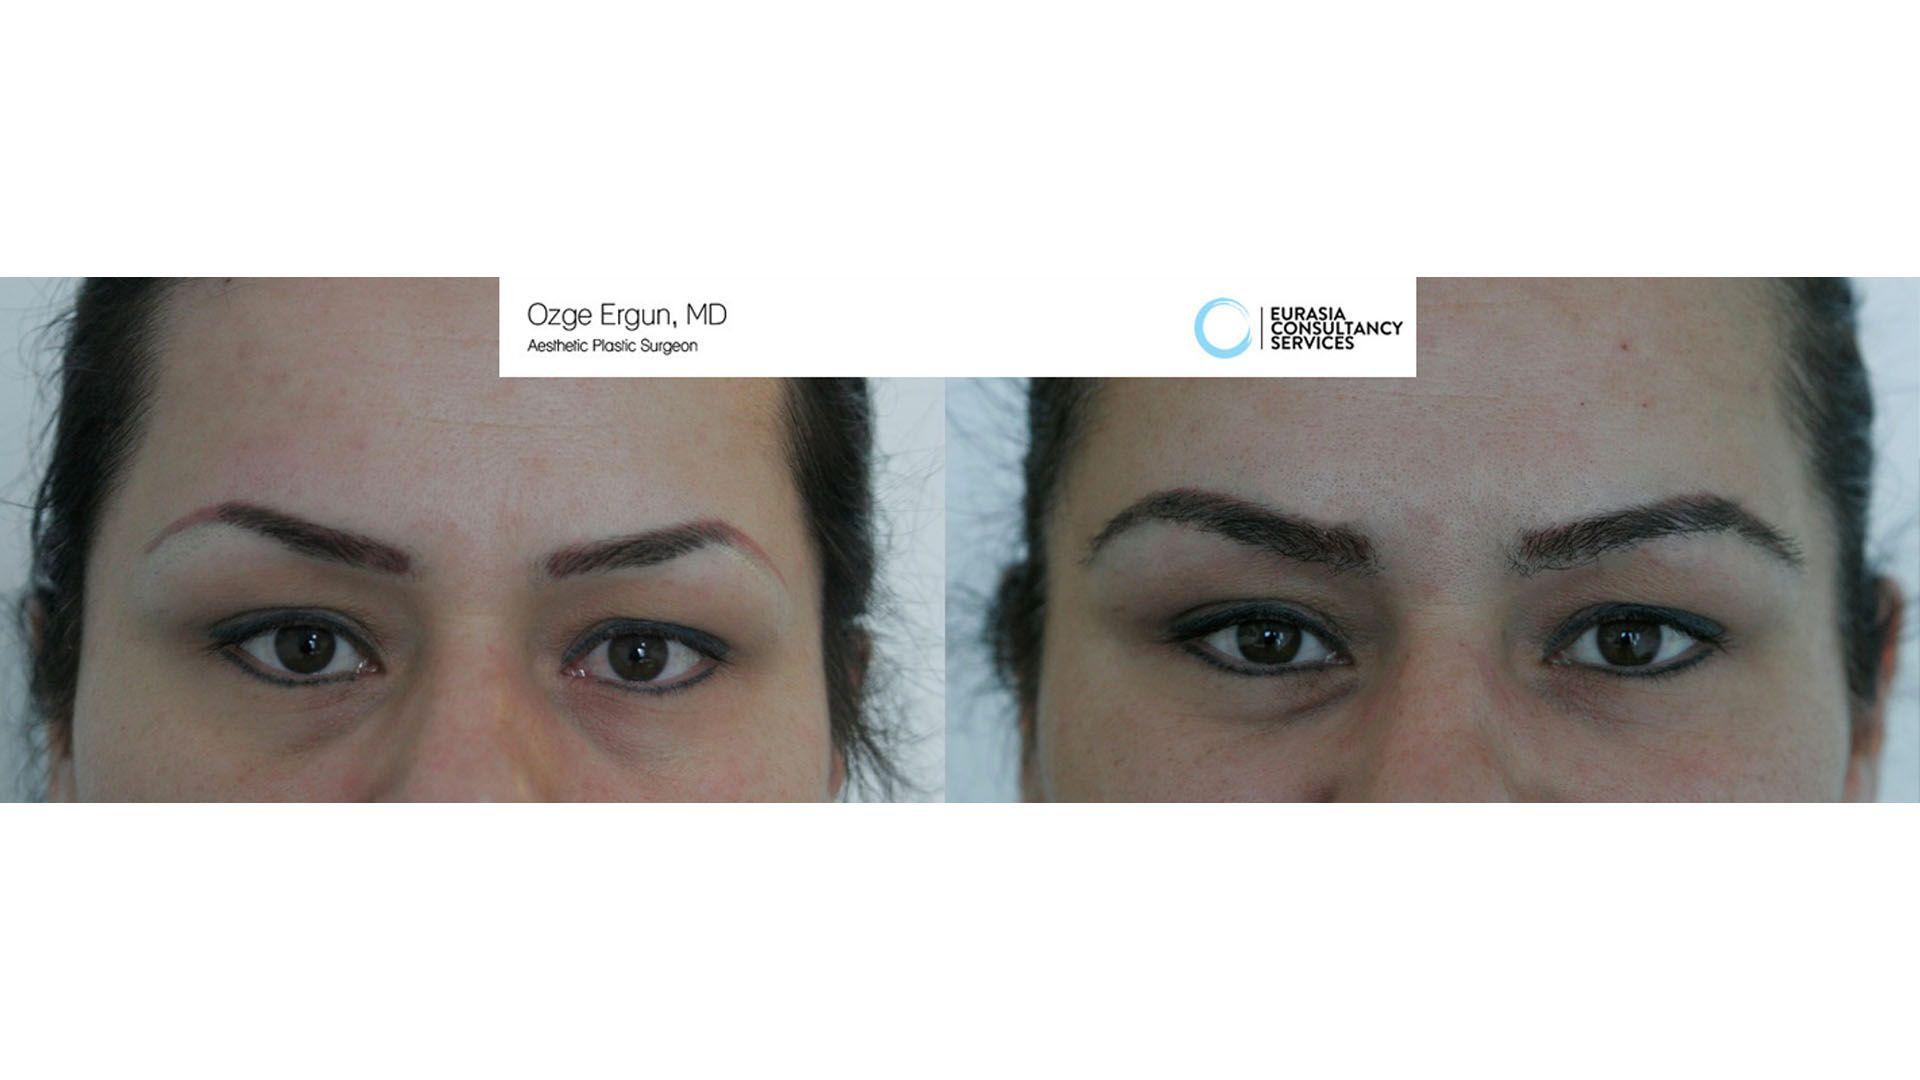 Eyebrow Transplant Surgery Ozge Ergun Md Https